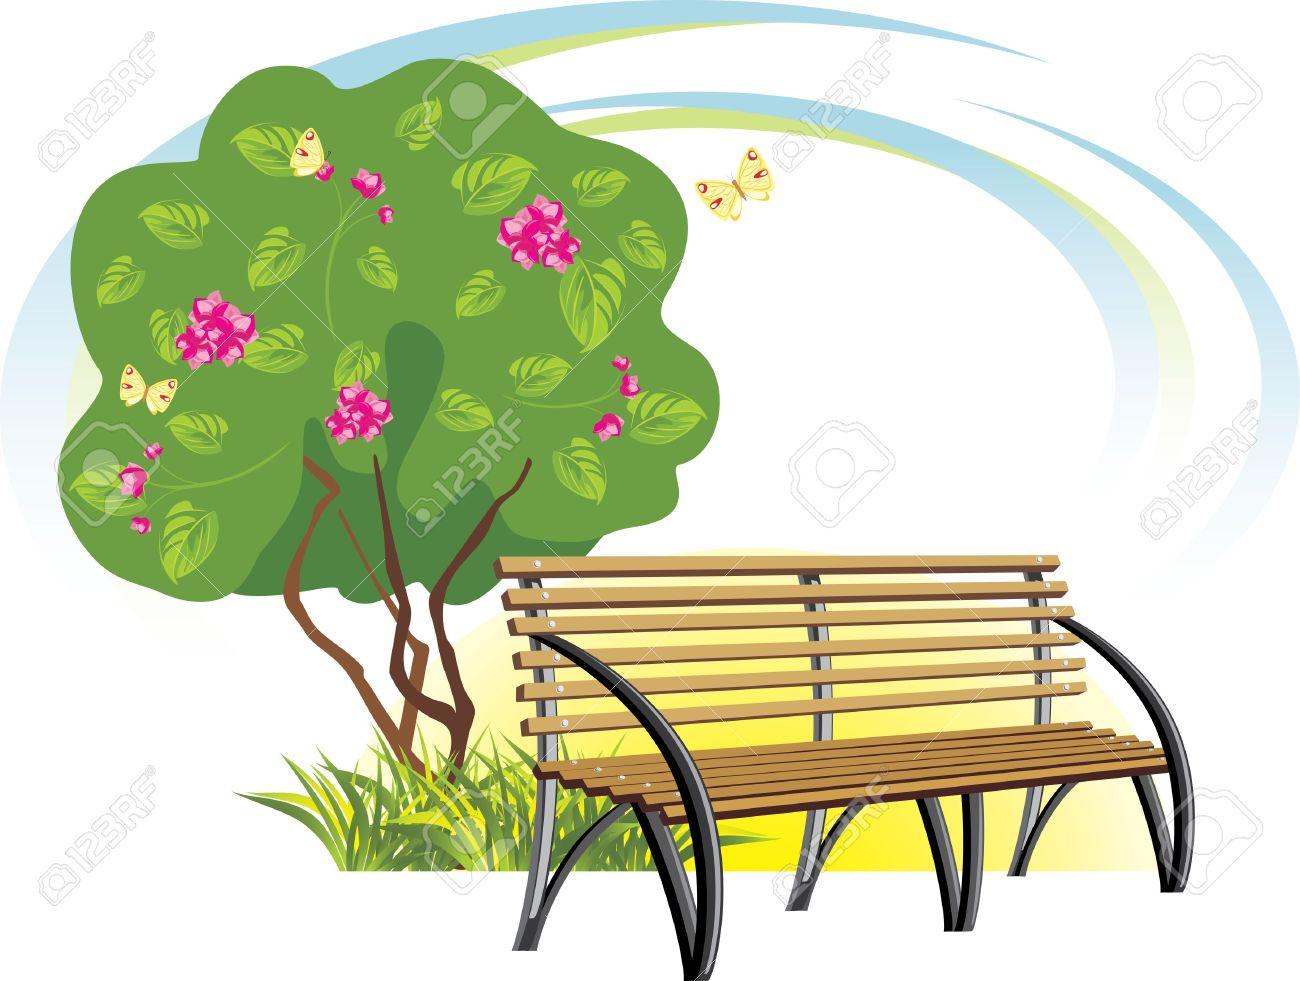 Bench clipart cartoon Bench Clipart hd Clipart clipart